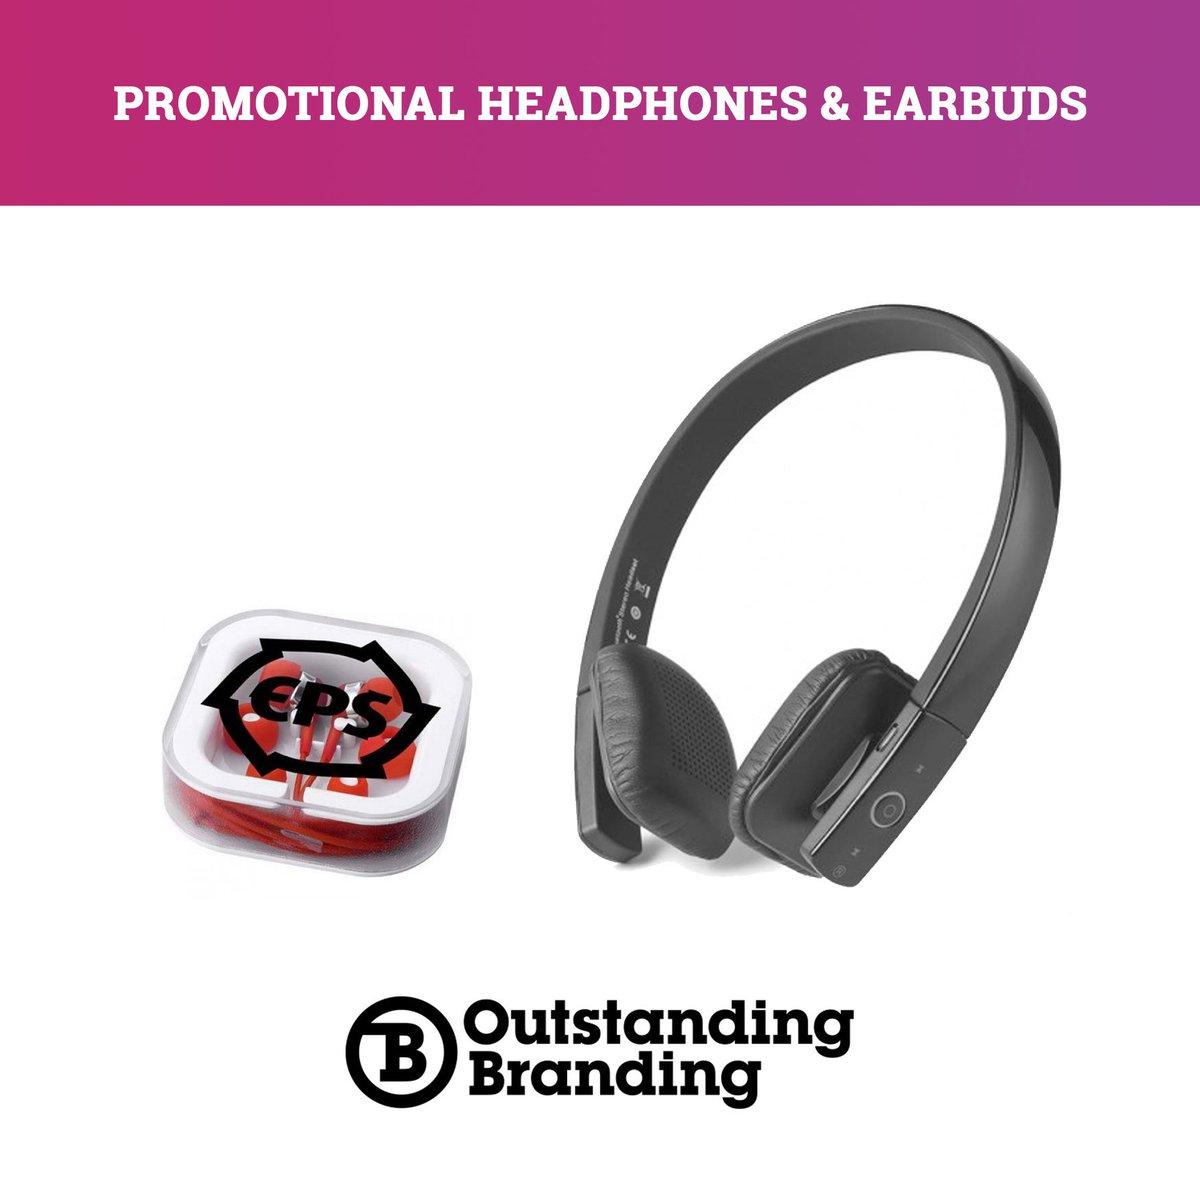 Outstanding Branding on Twitter: